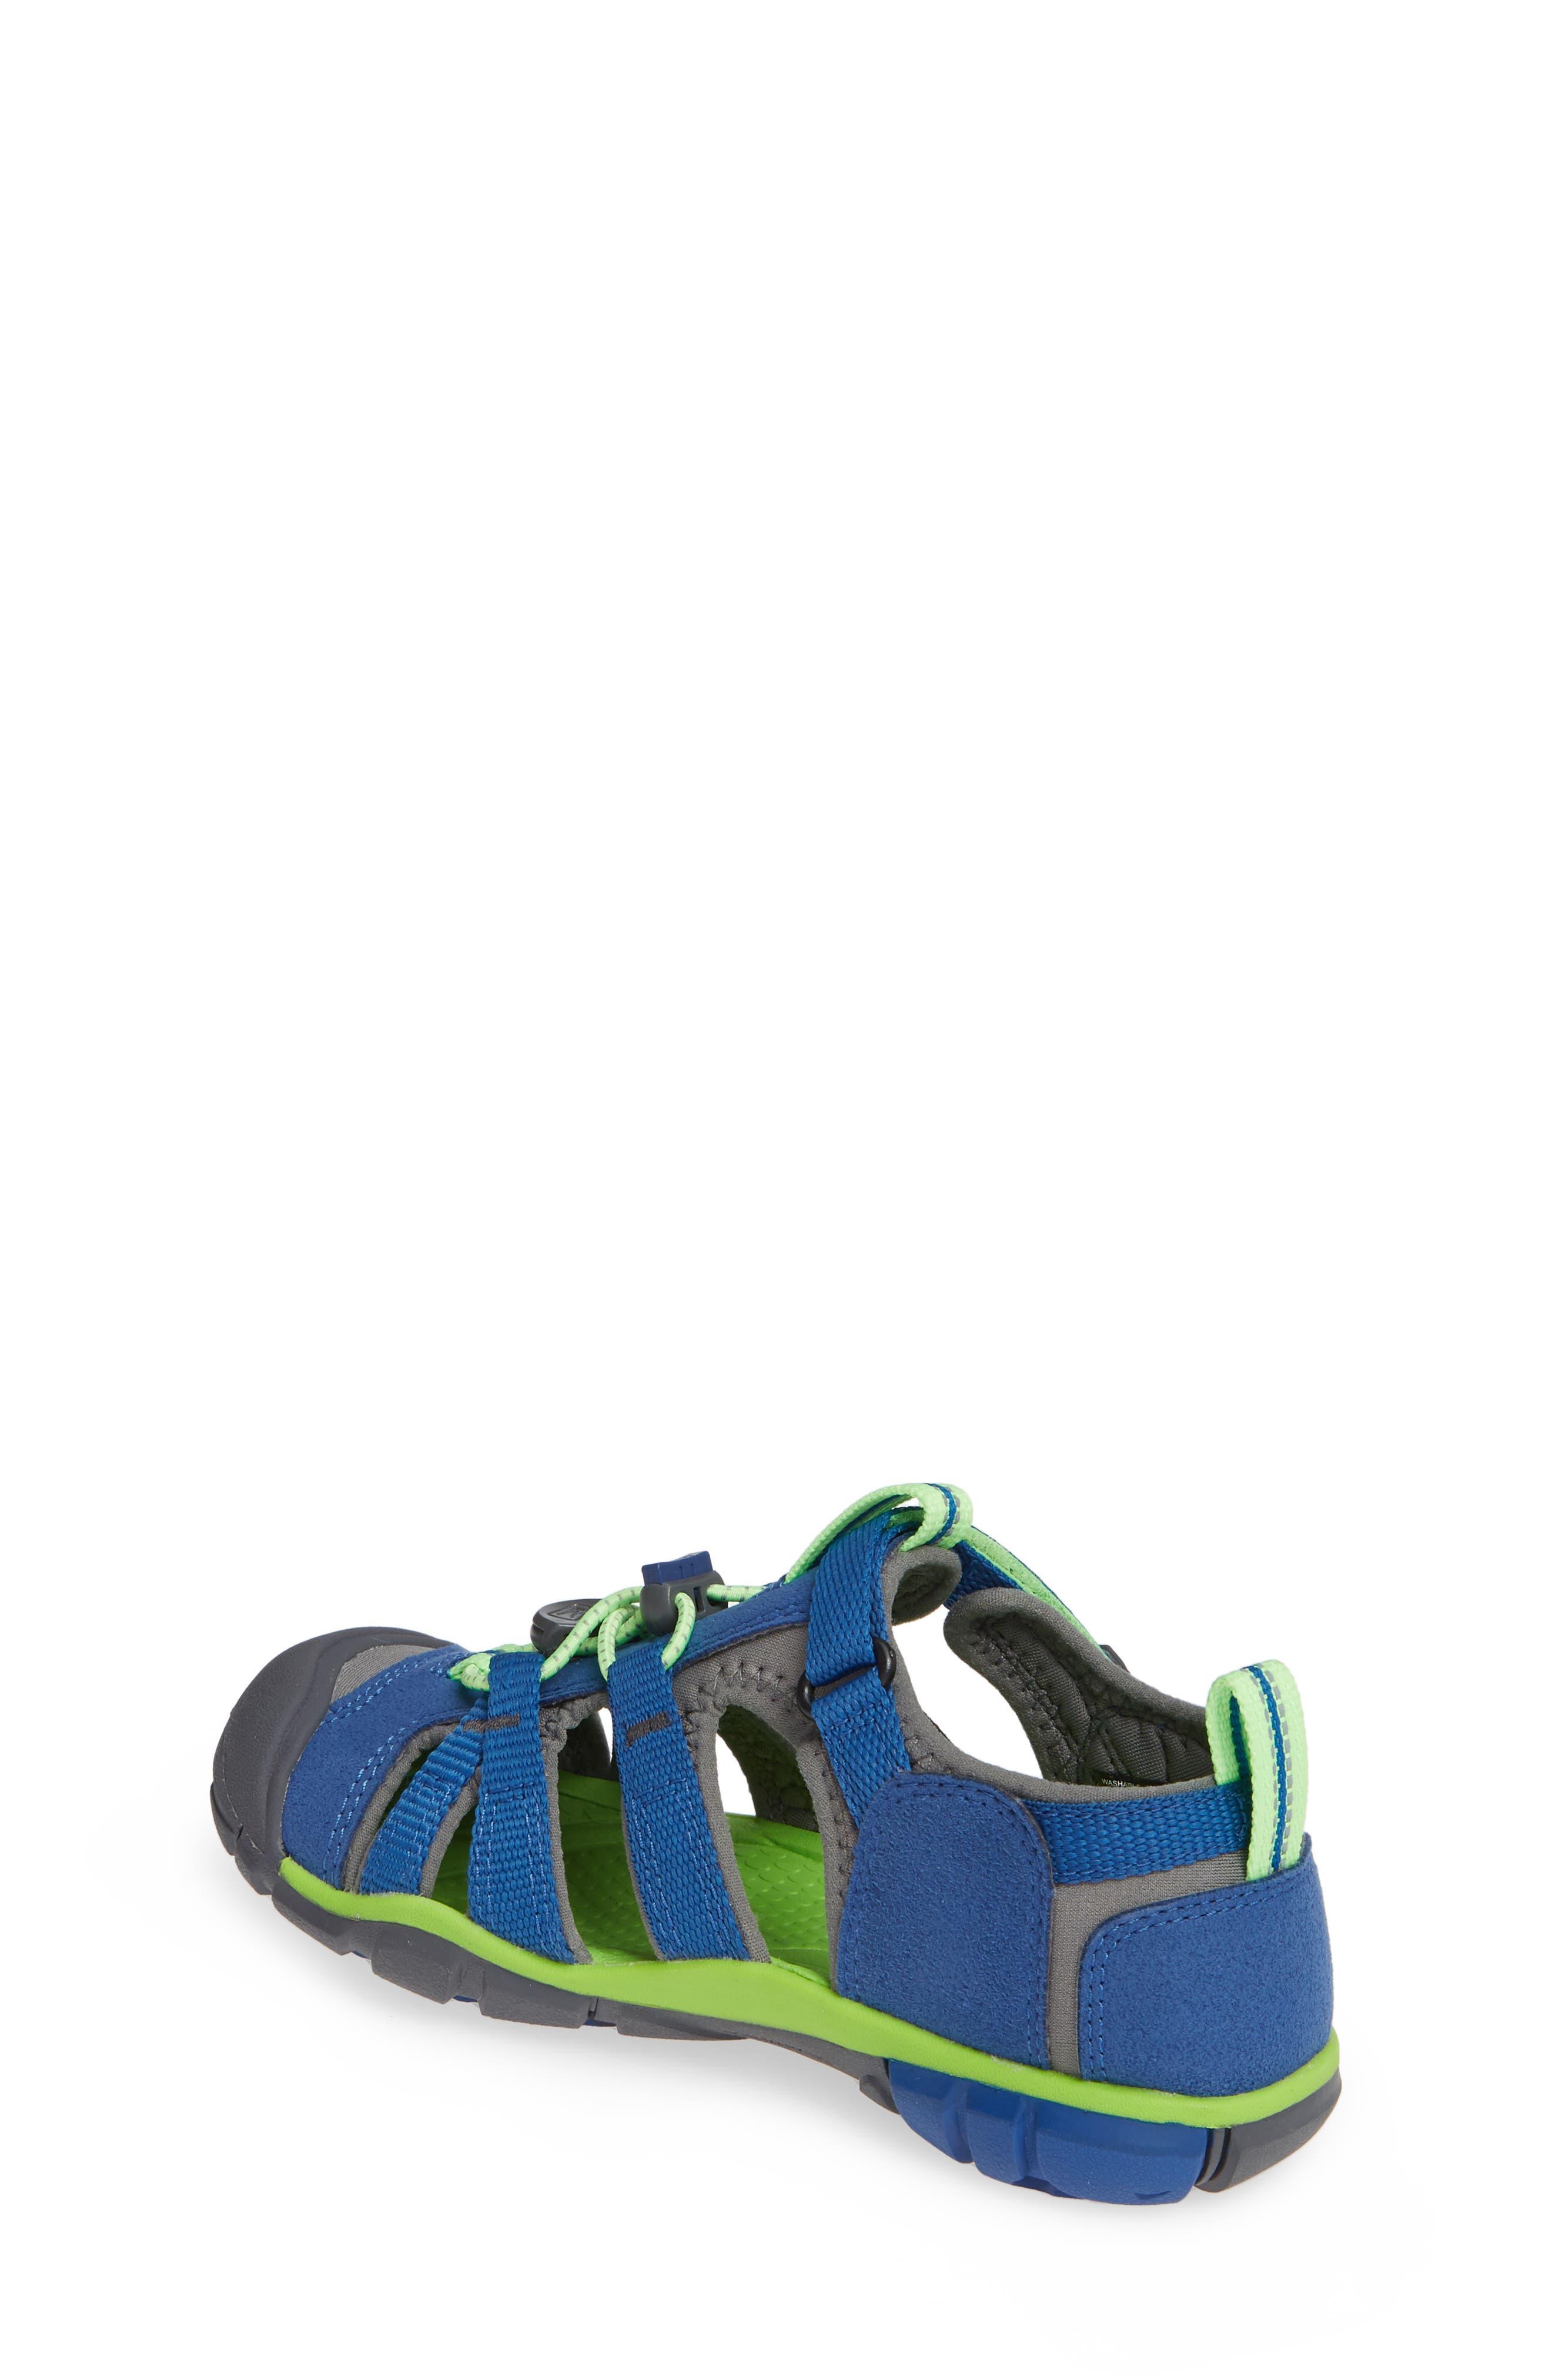 ,                             'Seacamp II' Water Friendly Sandal,                             Alternate thumbnail 38, color,                             401